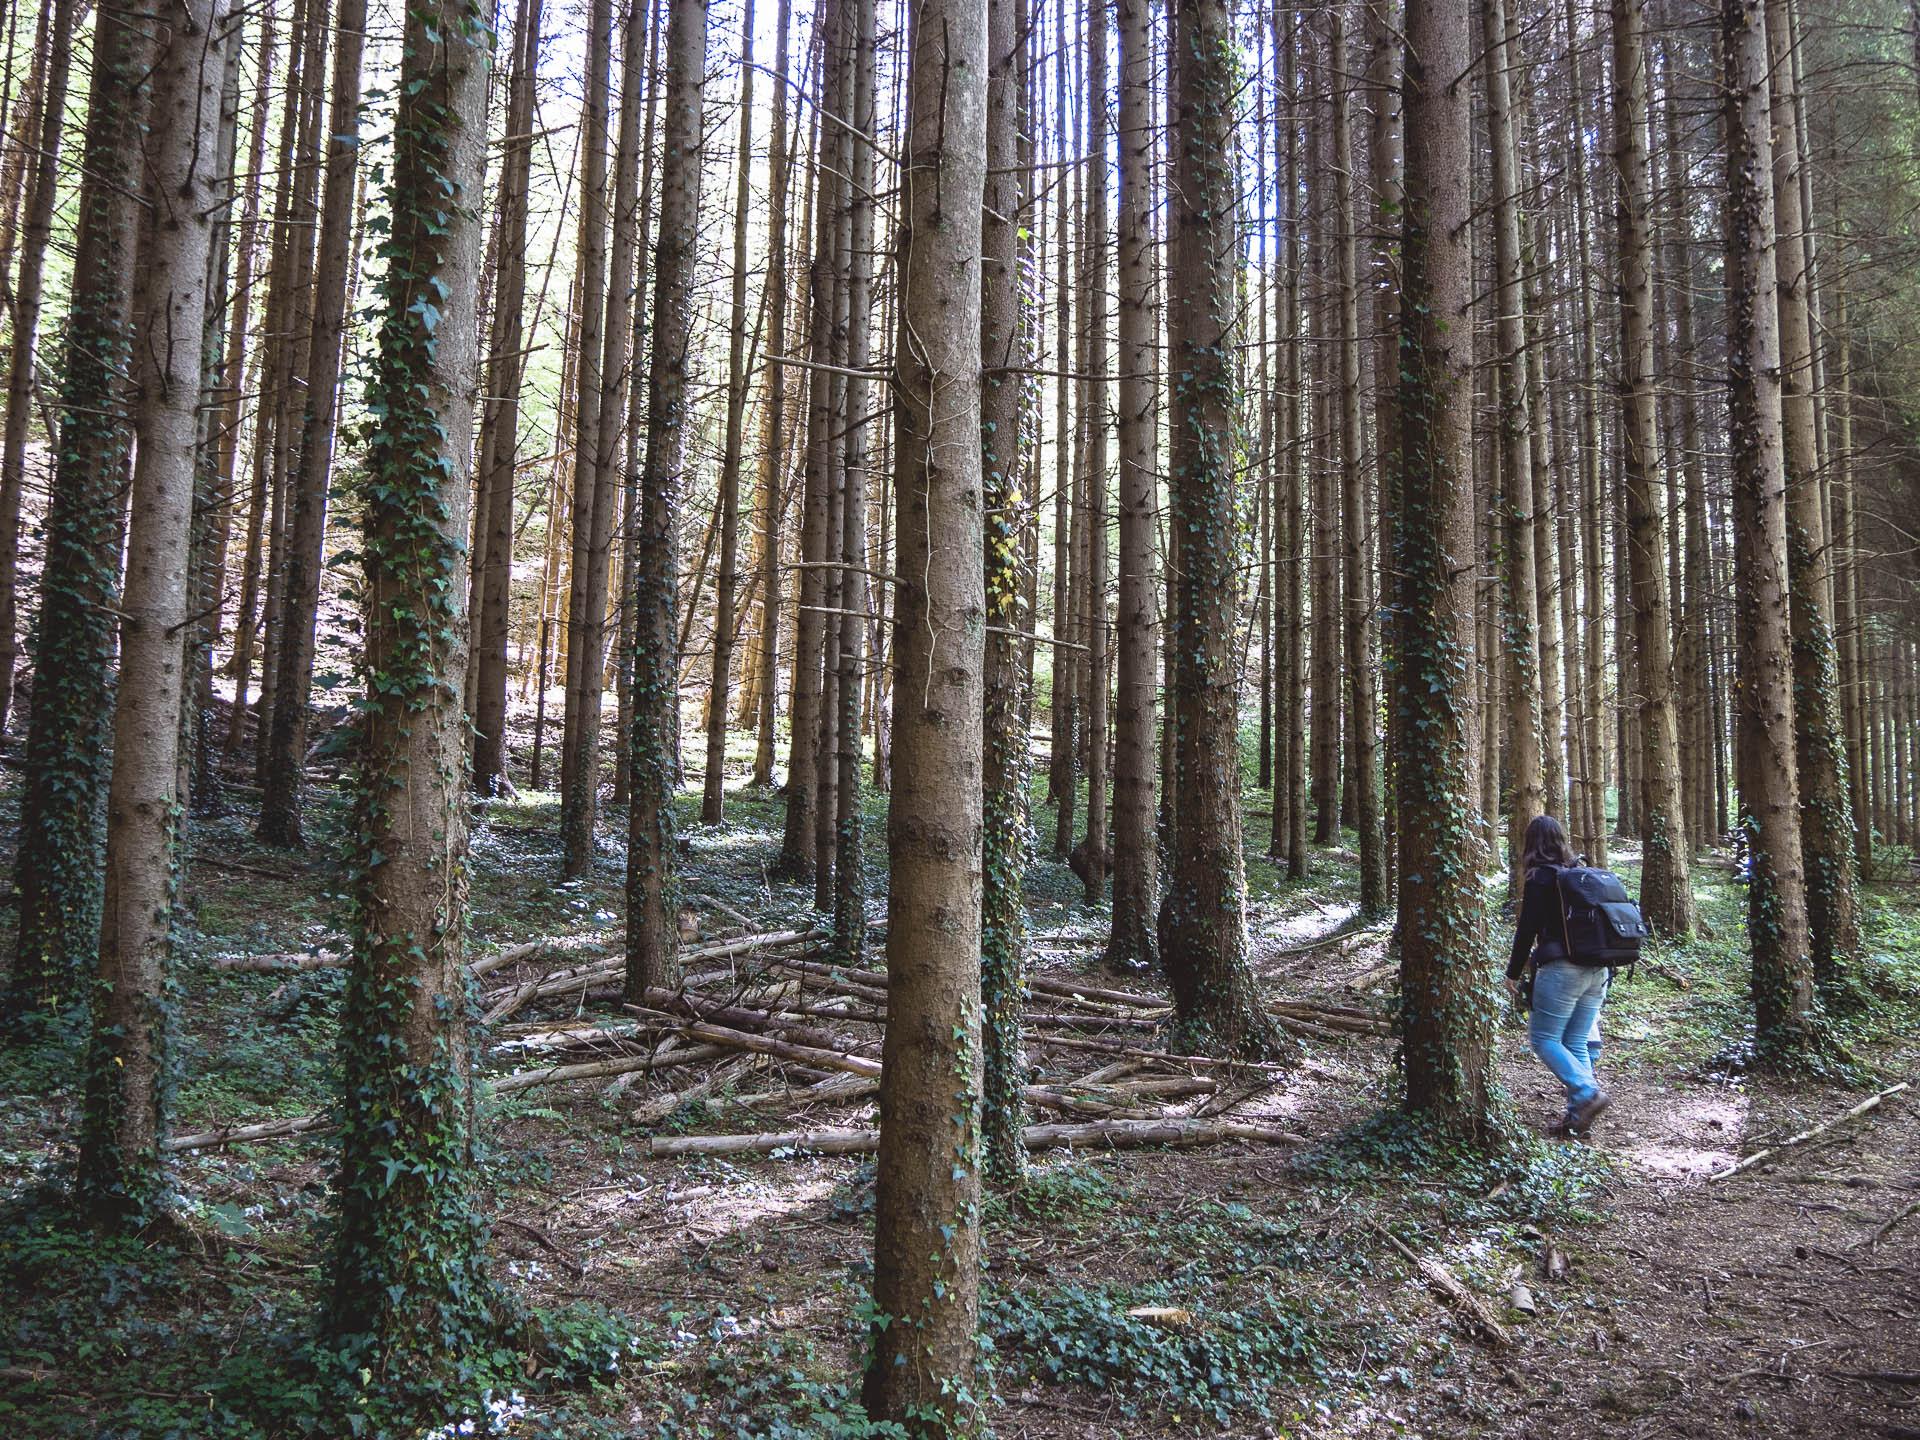 Ninglinspo forêt - Les globe blogueurs - blog voyage nature